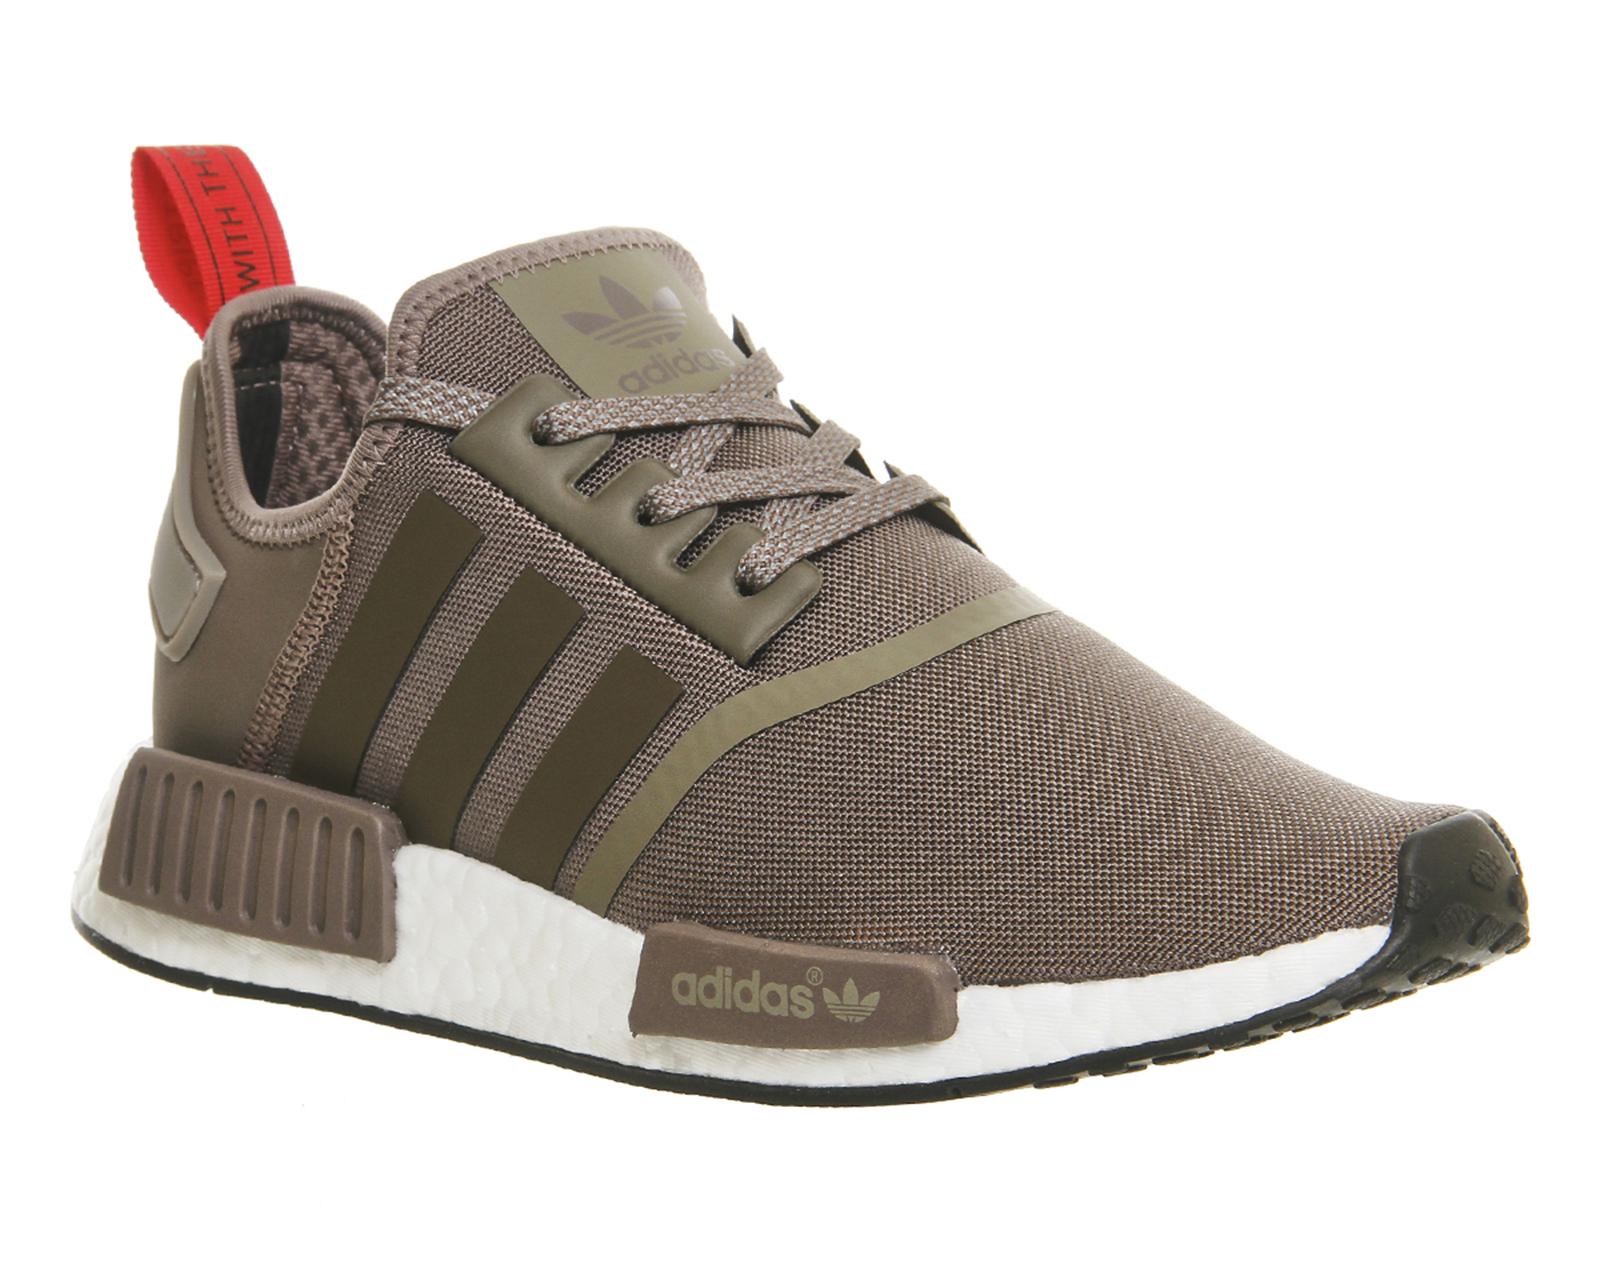 vjnwoa Mens Adidas Nmd Runner TECH EARTH WHITE Trainers Shoes   eBay